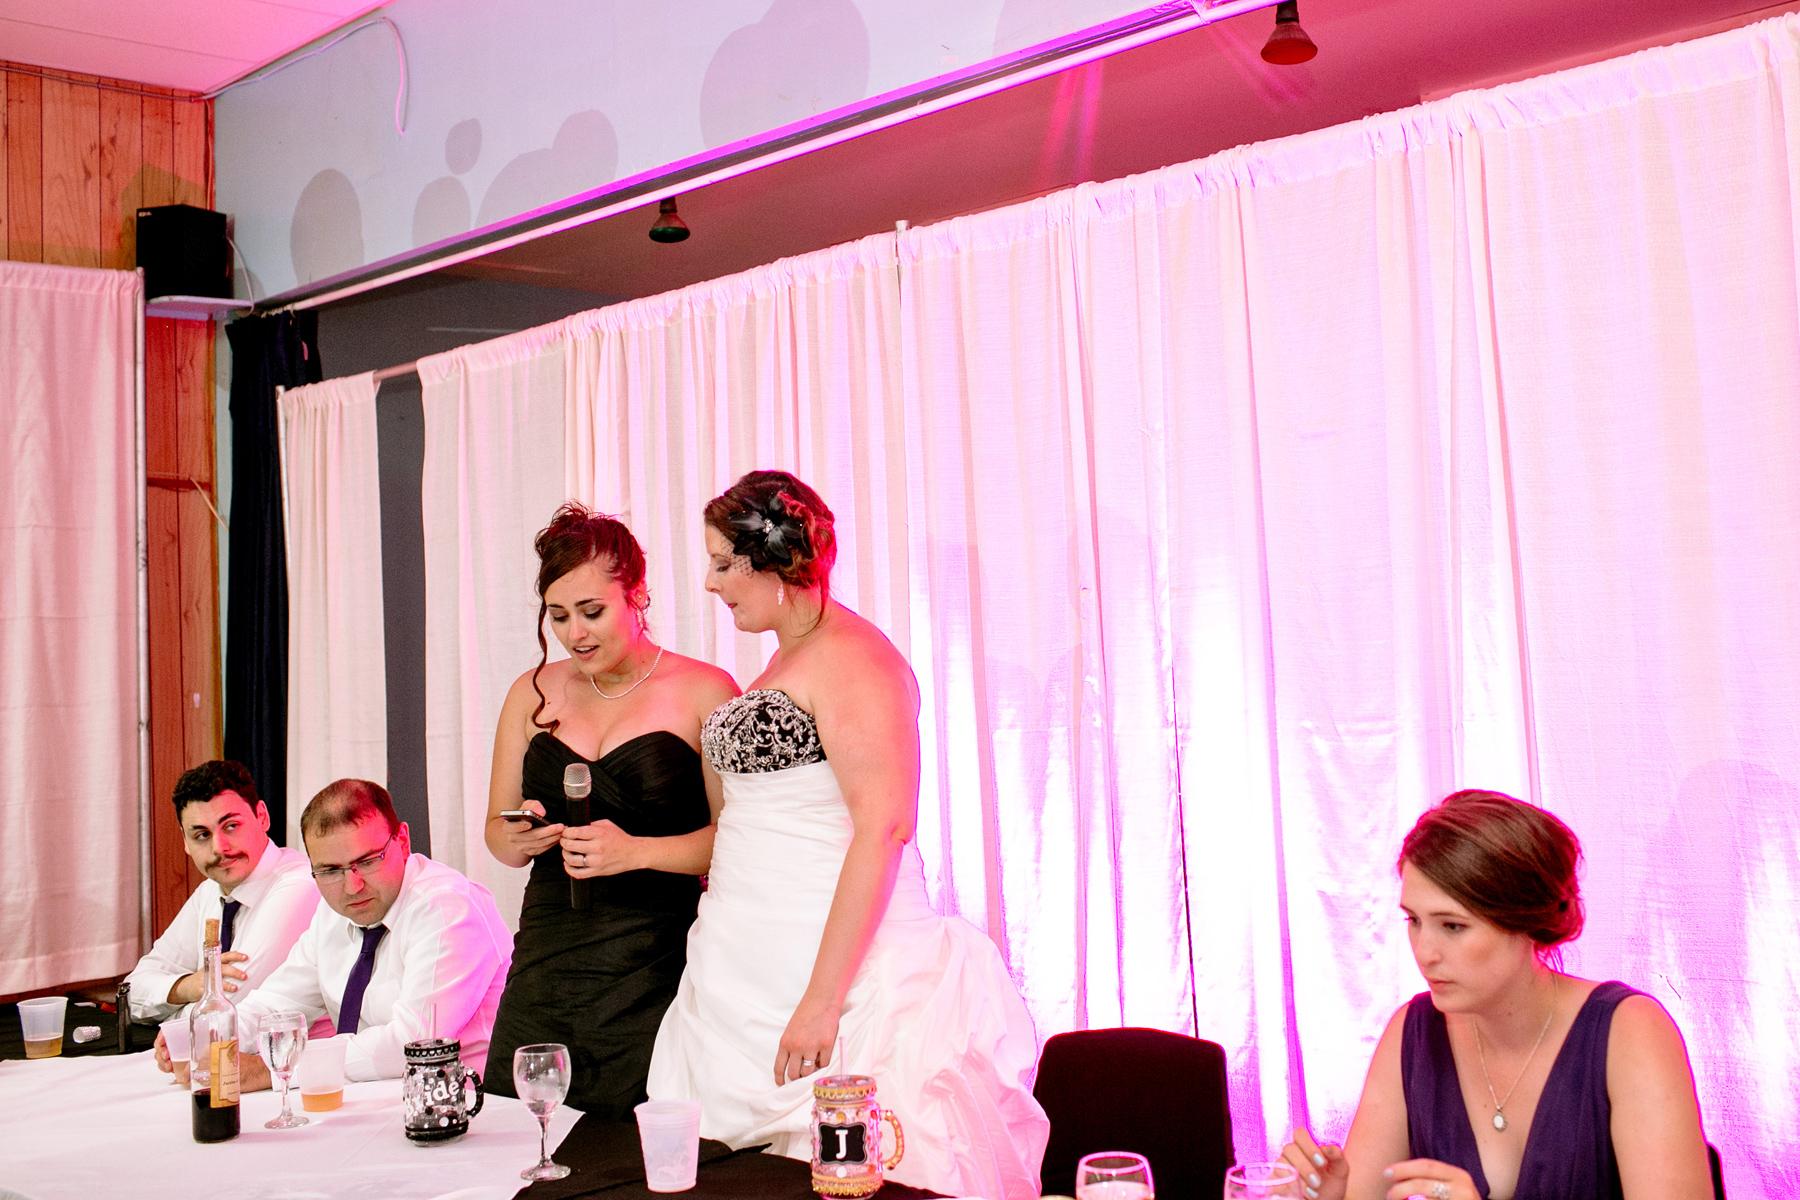 077-awesome-joggins-fossil-wedding-nova-scotia-kandisebrown-jl2016